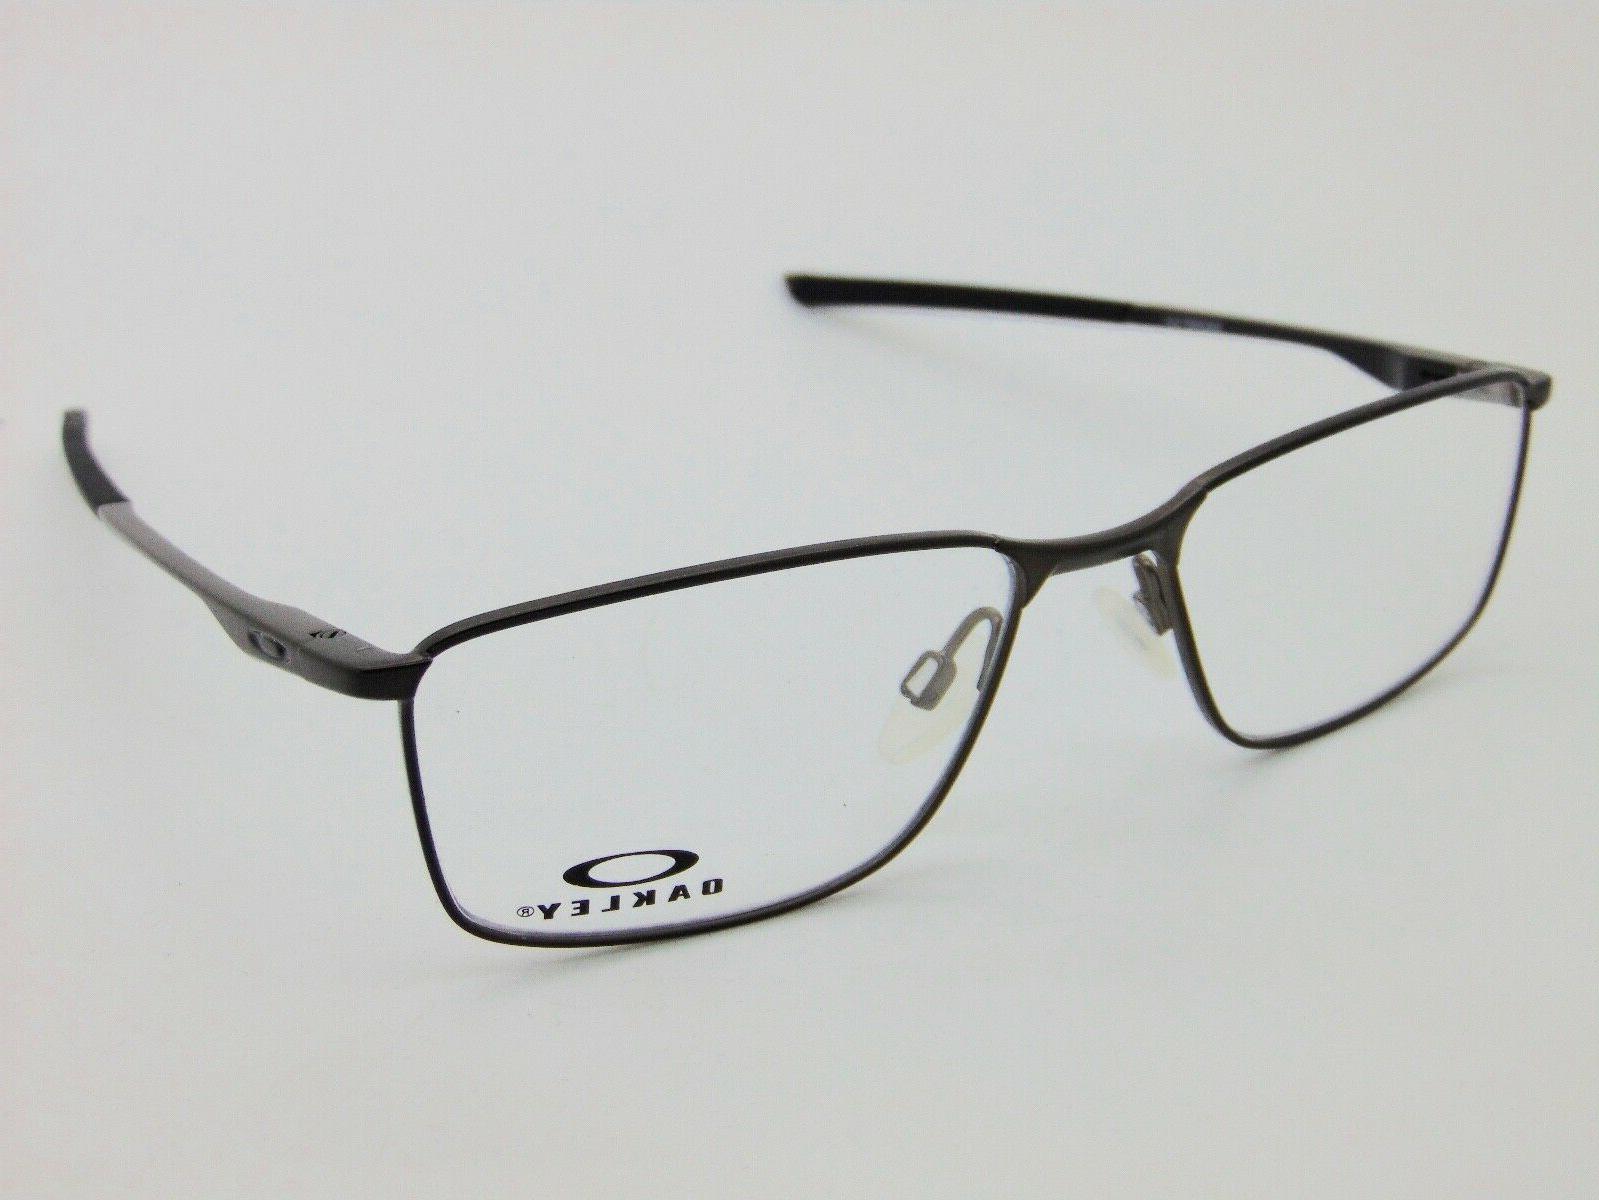 Satin Pewter Authentic Eyeglasses